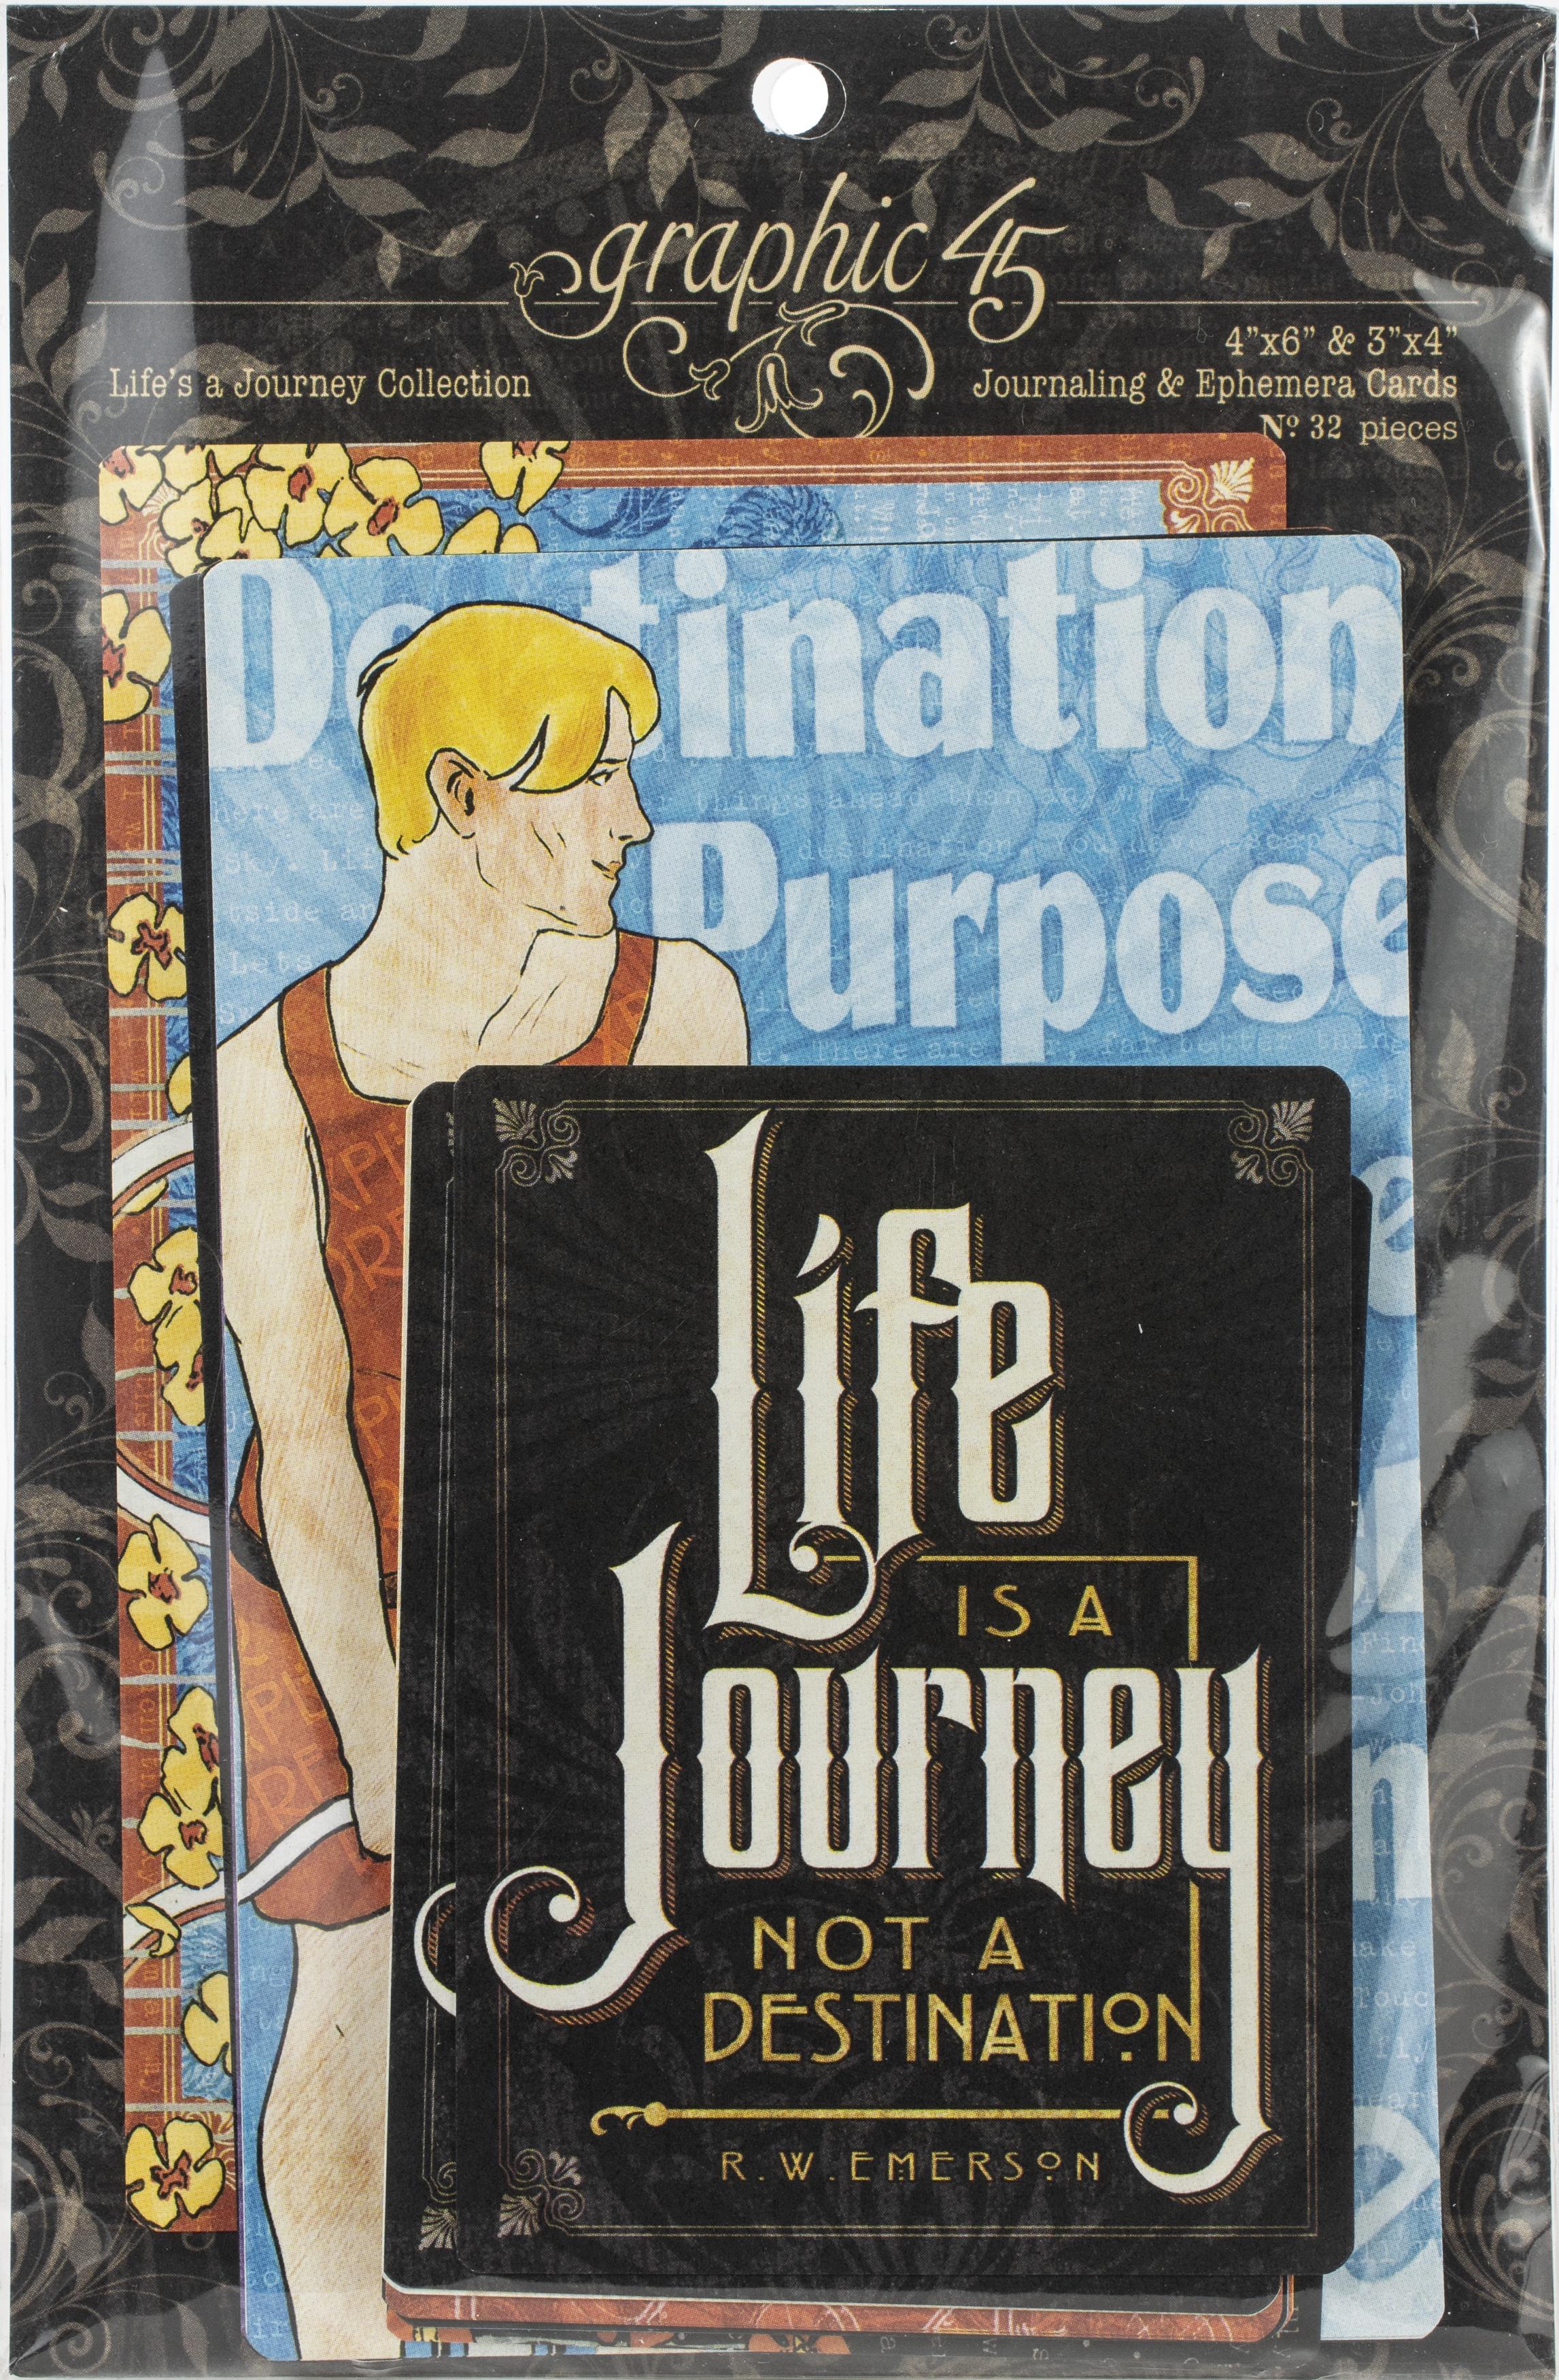 G45 Life's a Journey Journaling & ephemera cards